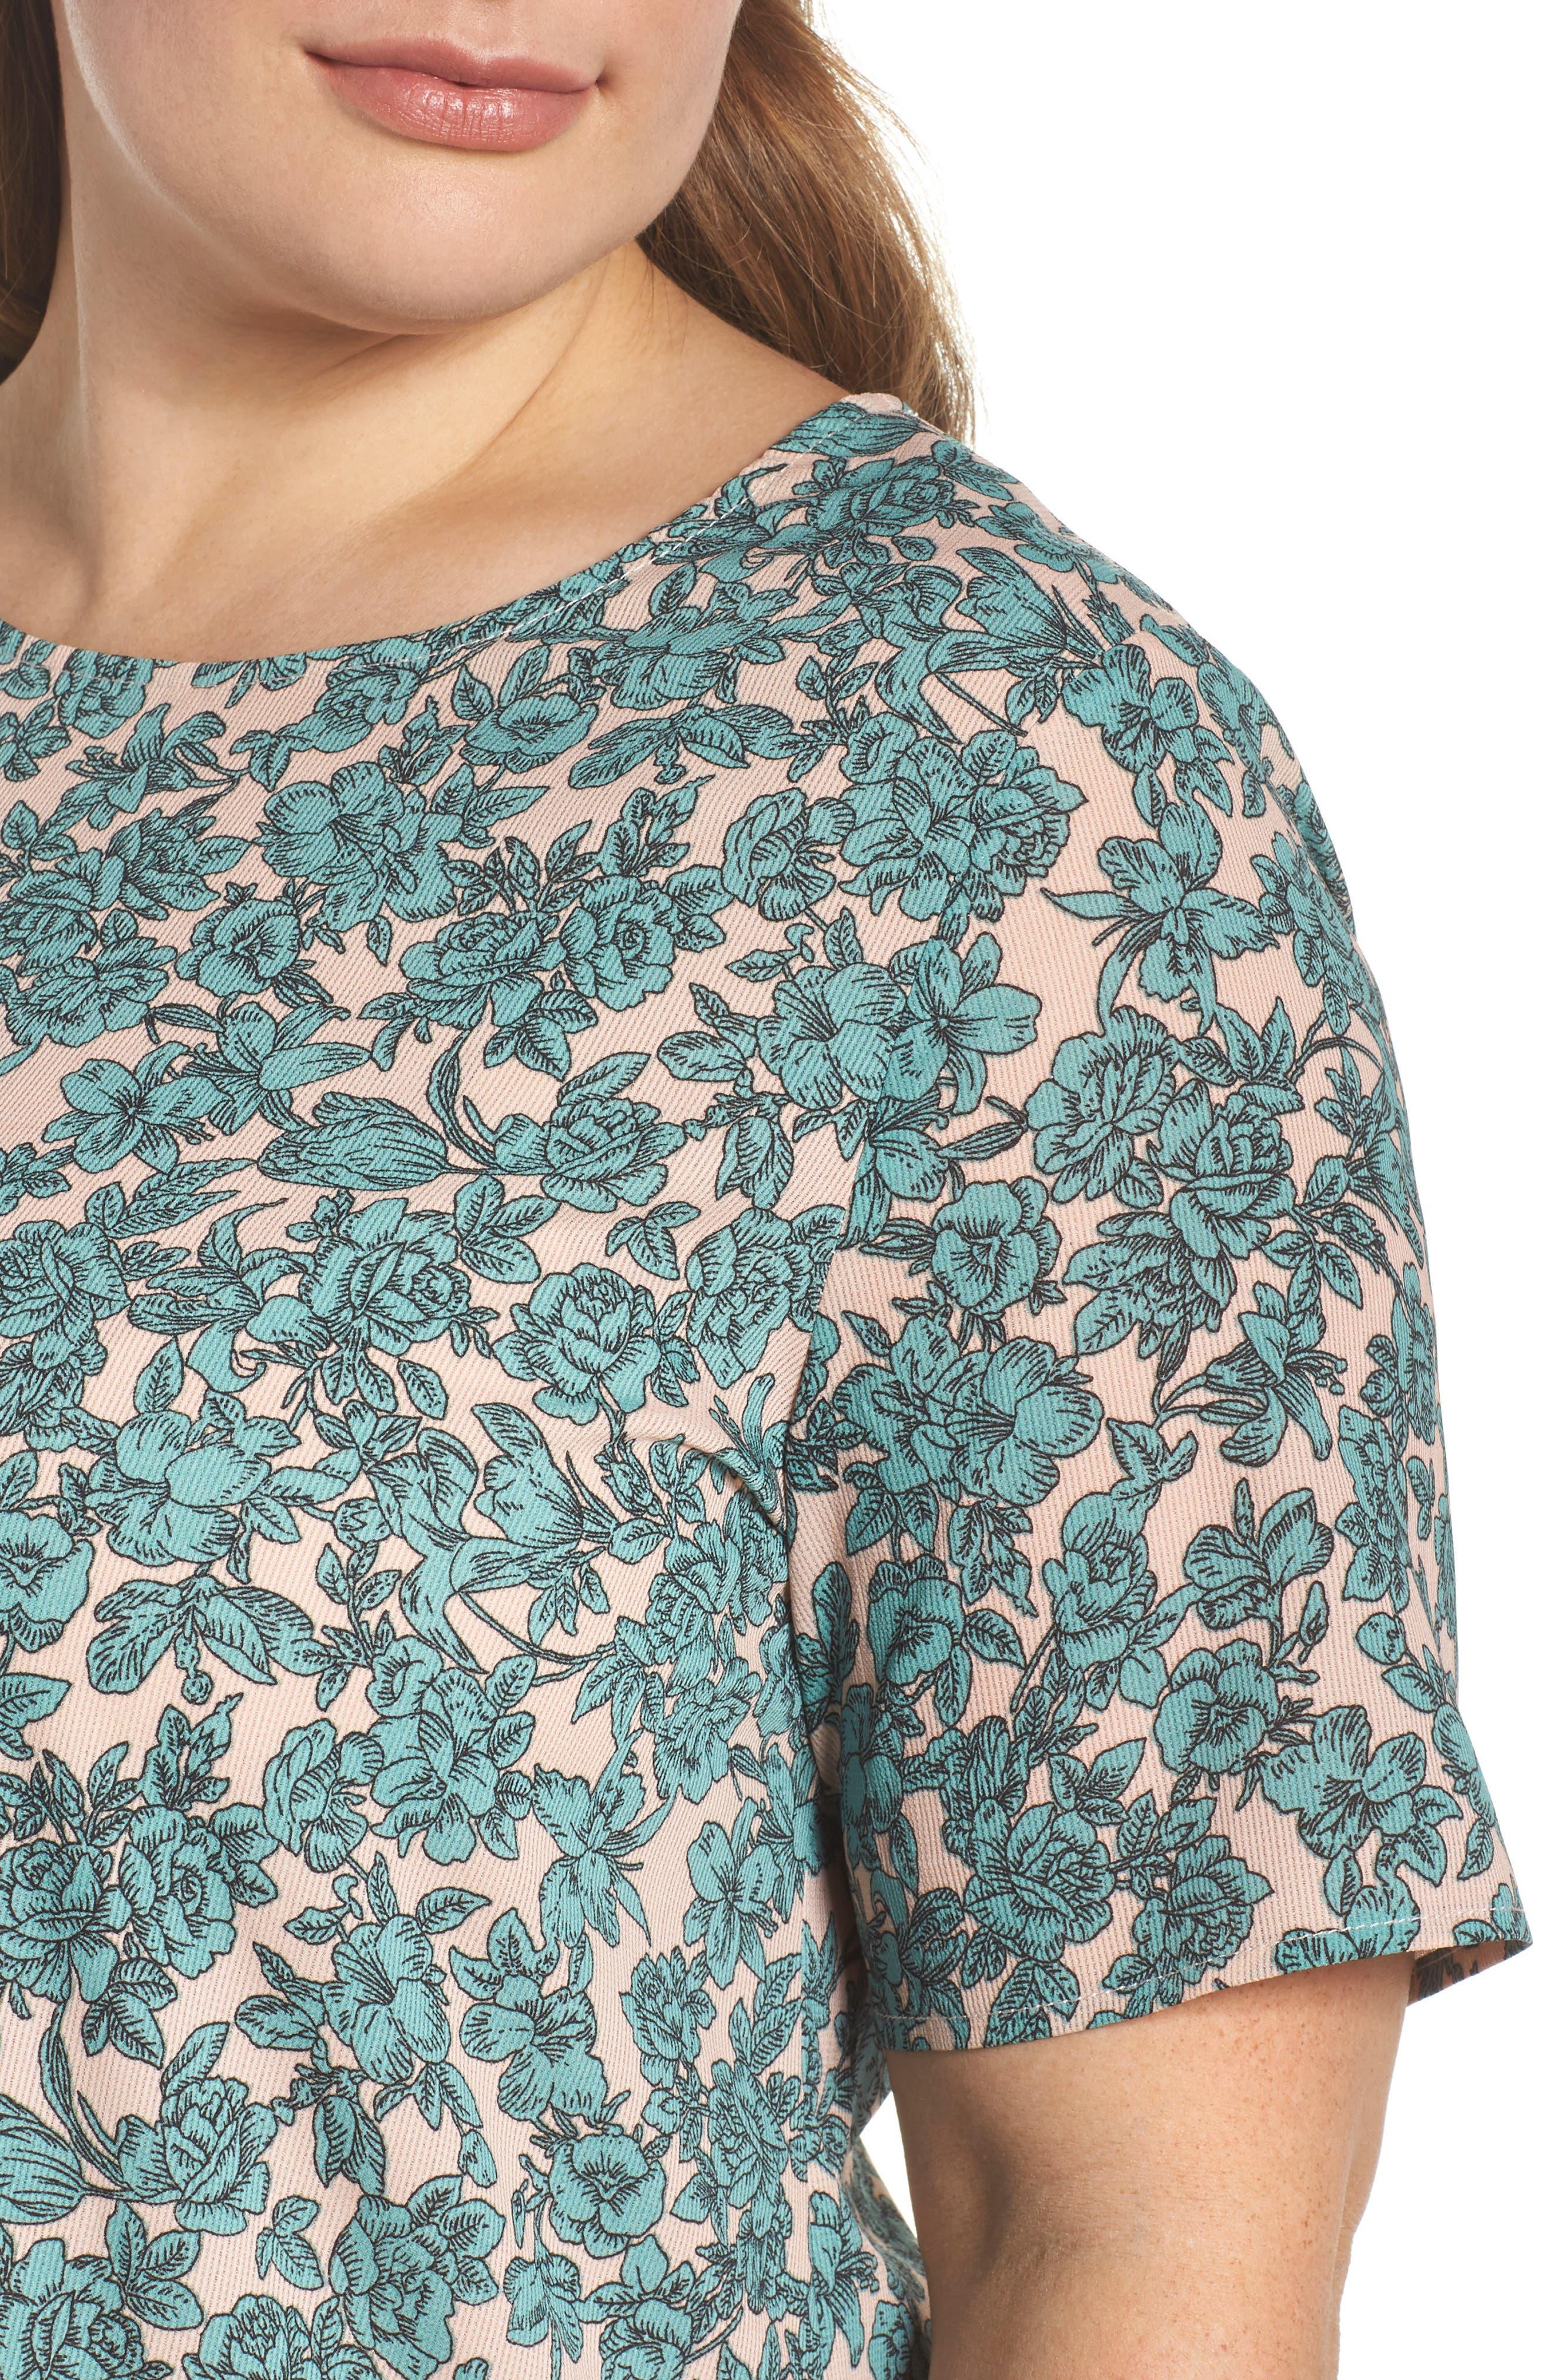 Floral Shift Dress,                             Alternate thumbnail 4, color,                             300